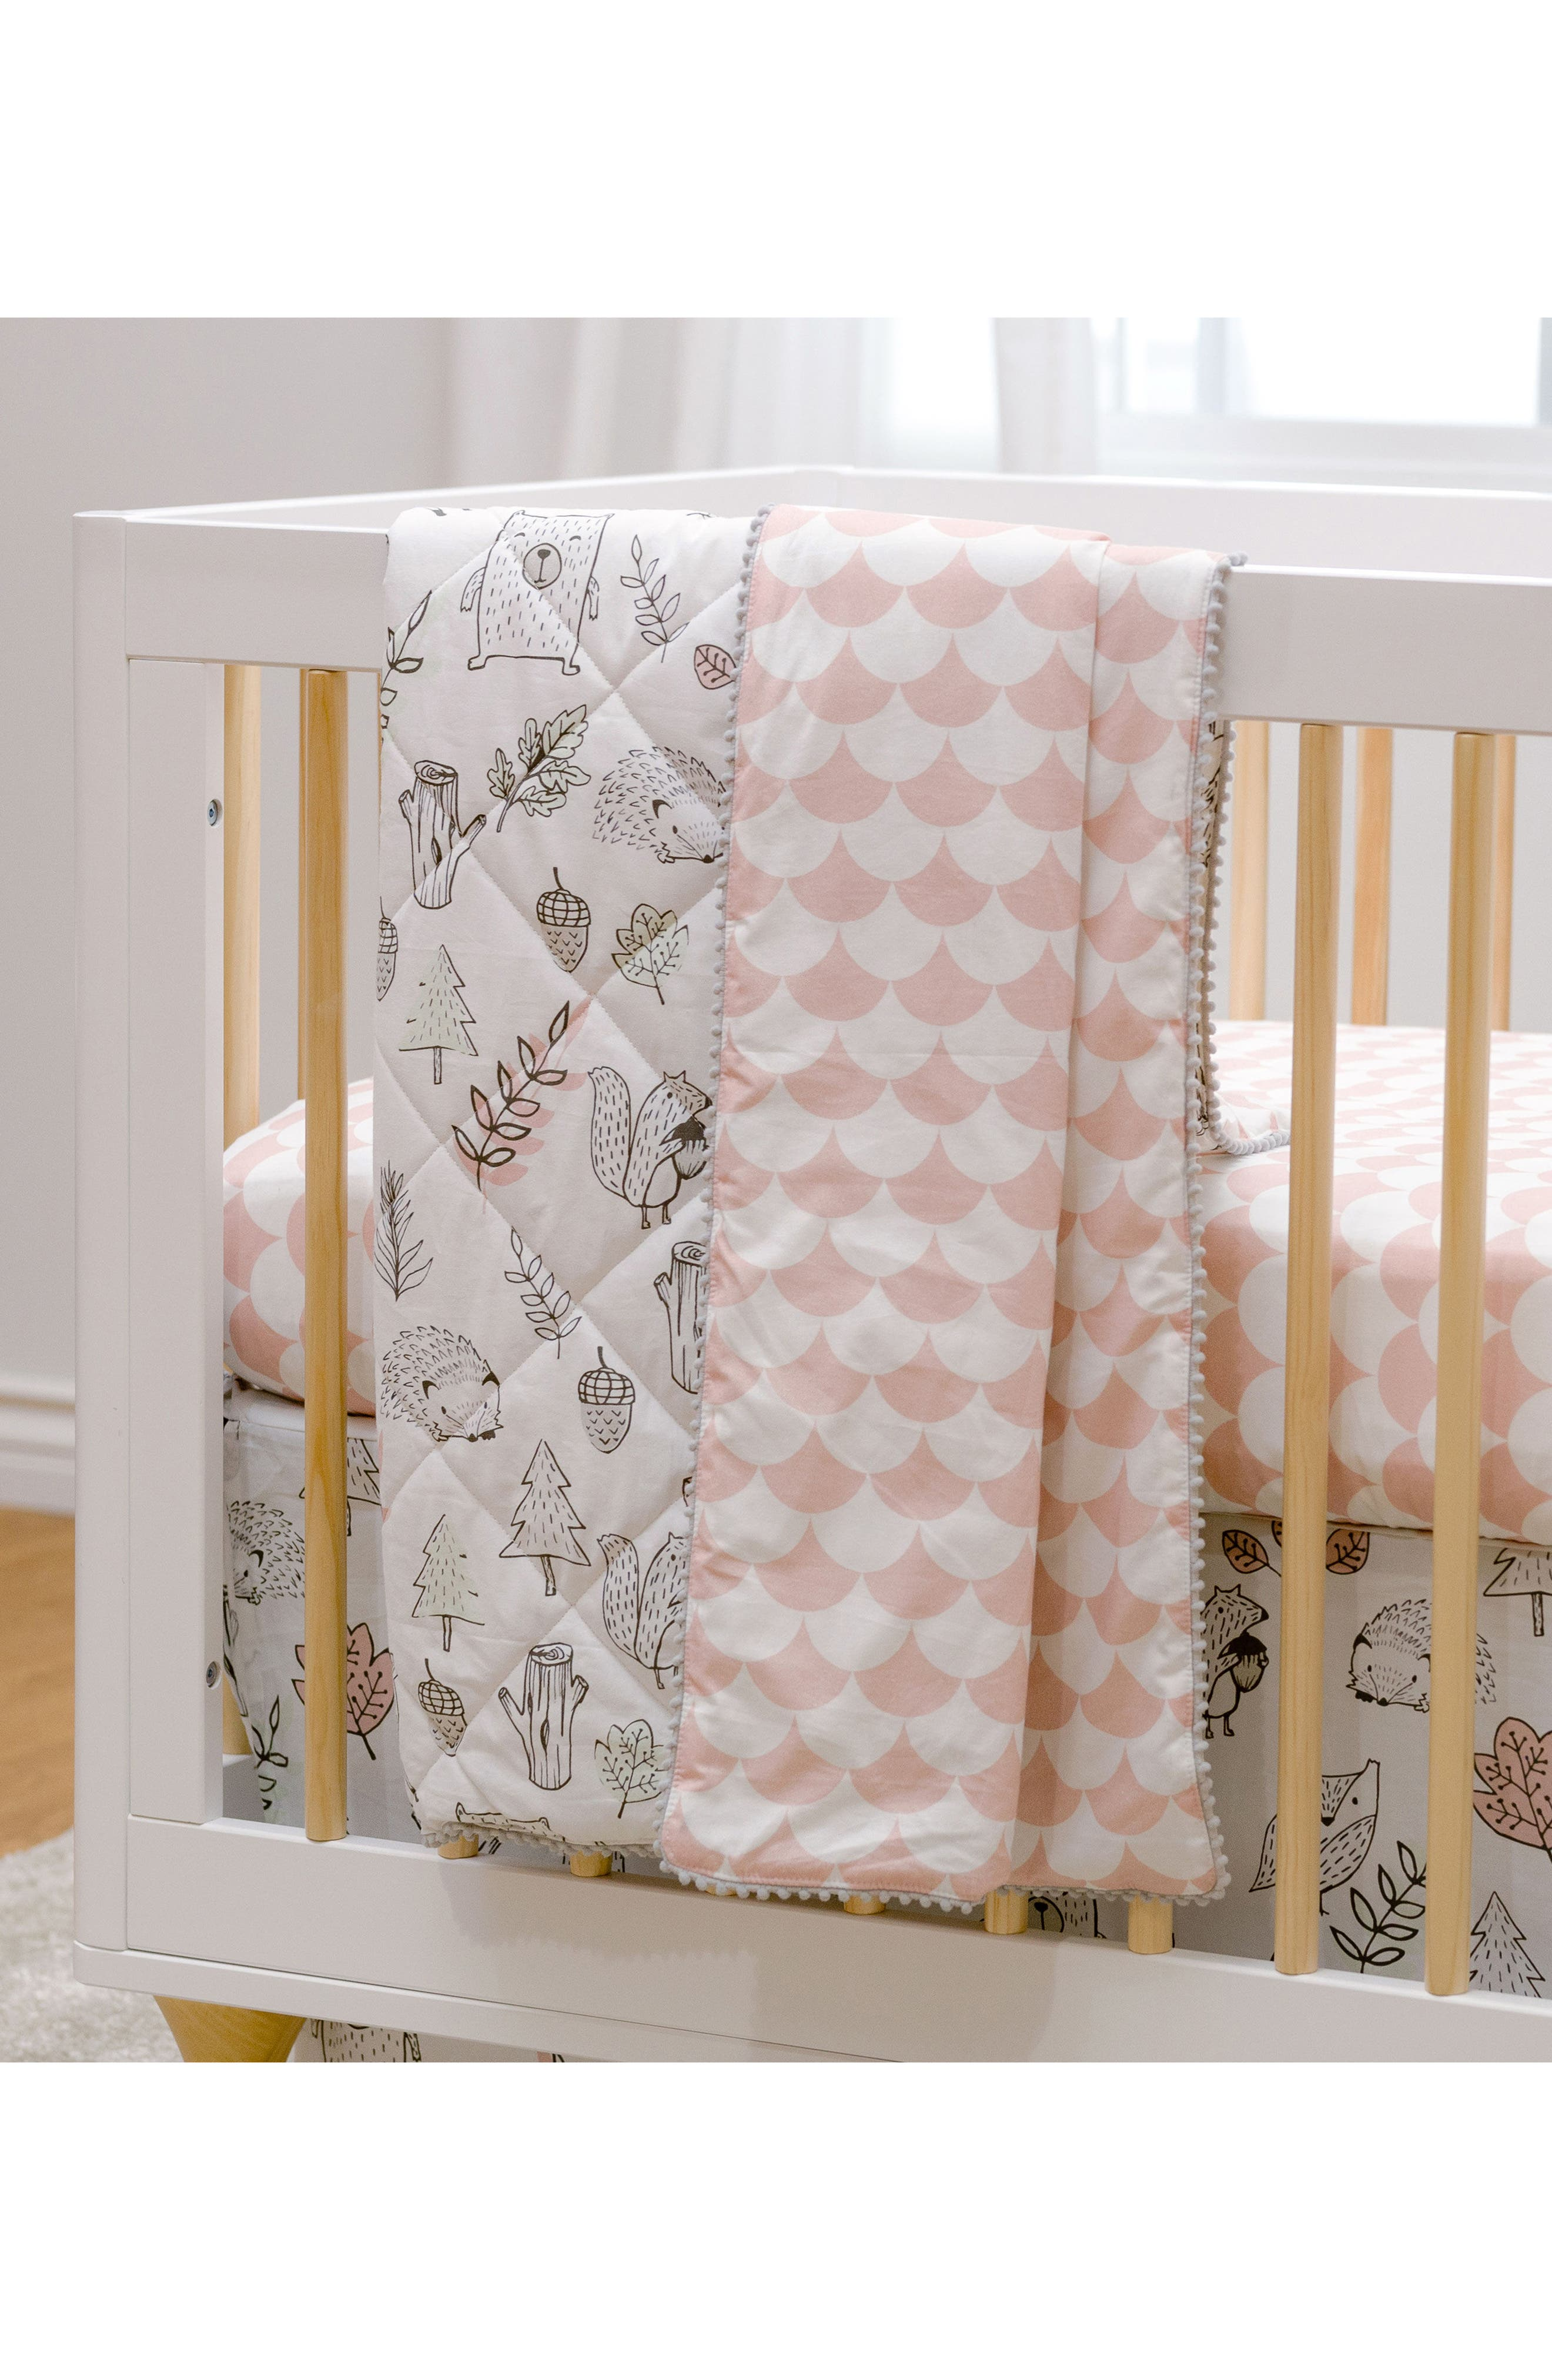 Woodlands 4-Piece Crib Bedding Set,                             Alternate thumbnail 9, color,                             KAYDEN - WOODLANDS